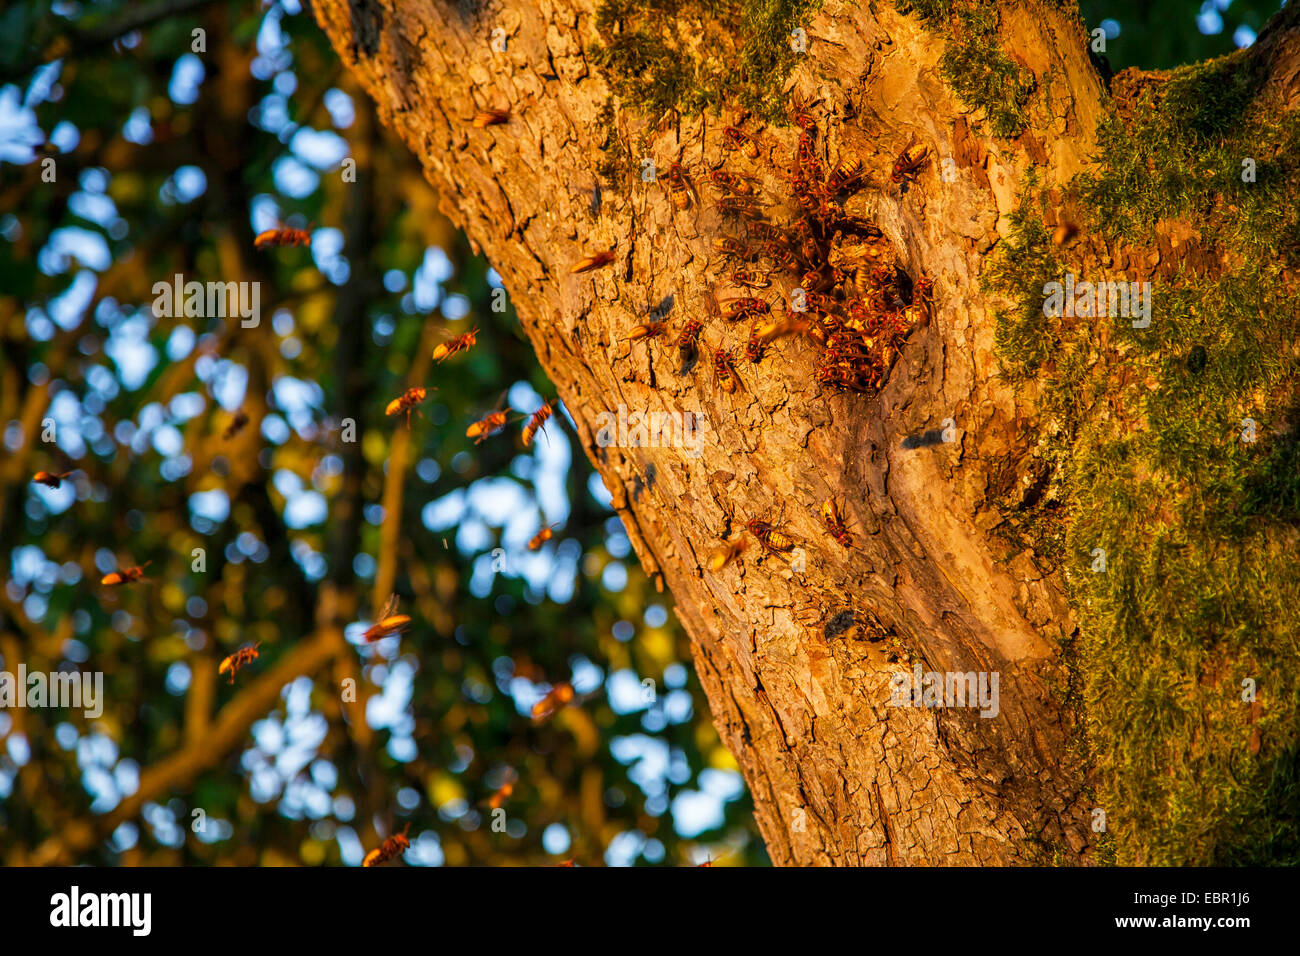 hornet, brown hornet, European hornet (Vespa crabro), hornet nest in a knothole of an apple tree, Germany, Rhineland - Stock Image